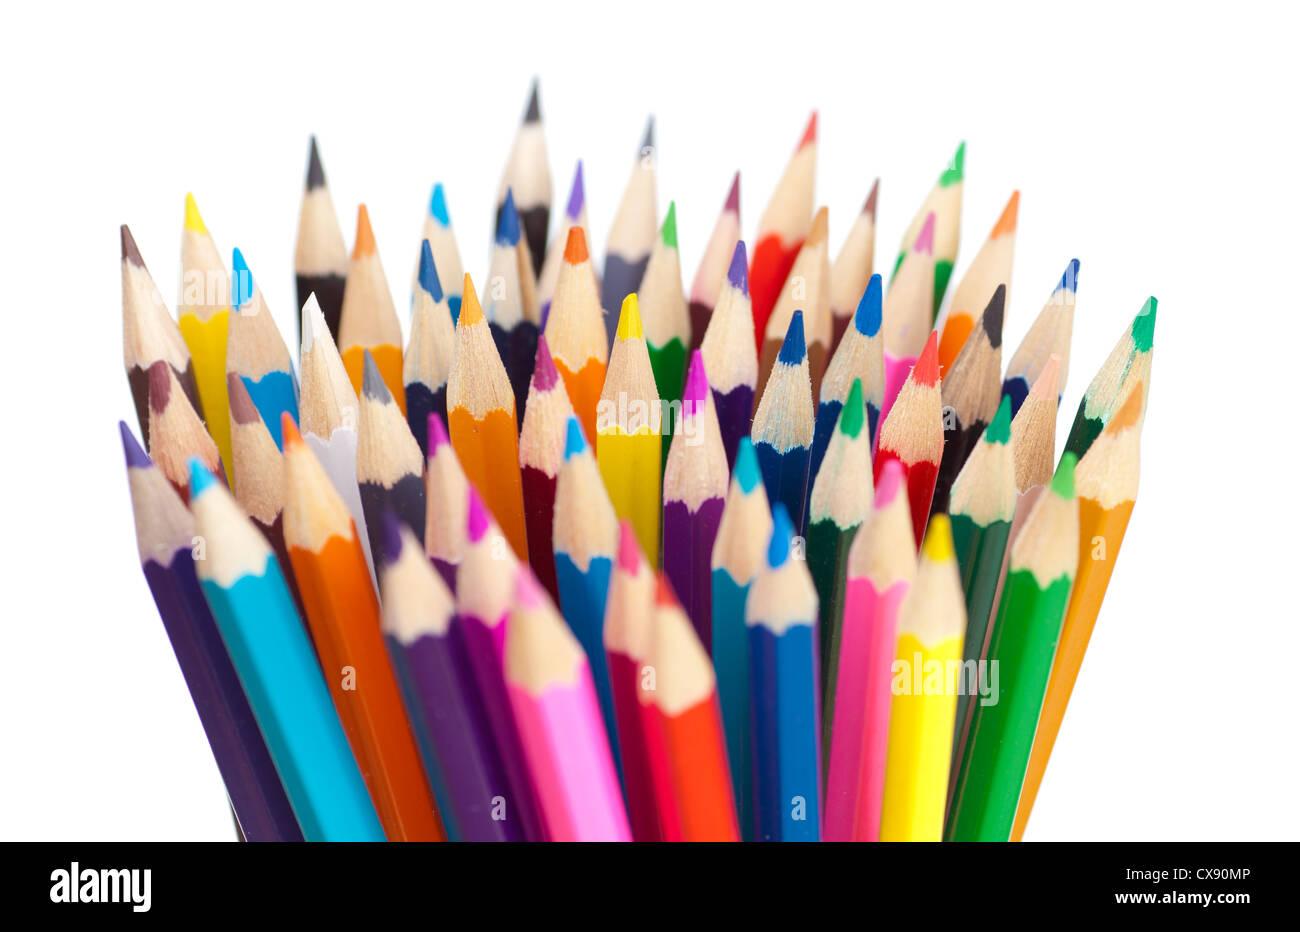 color pencils bunch macro shot - Stock Image